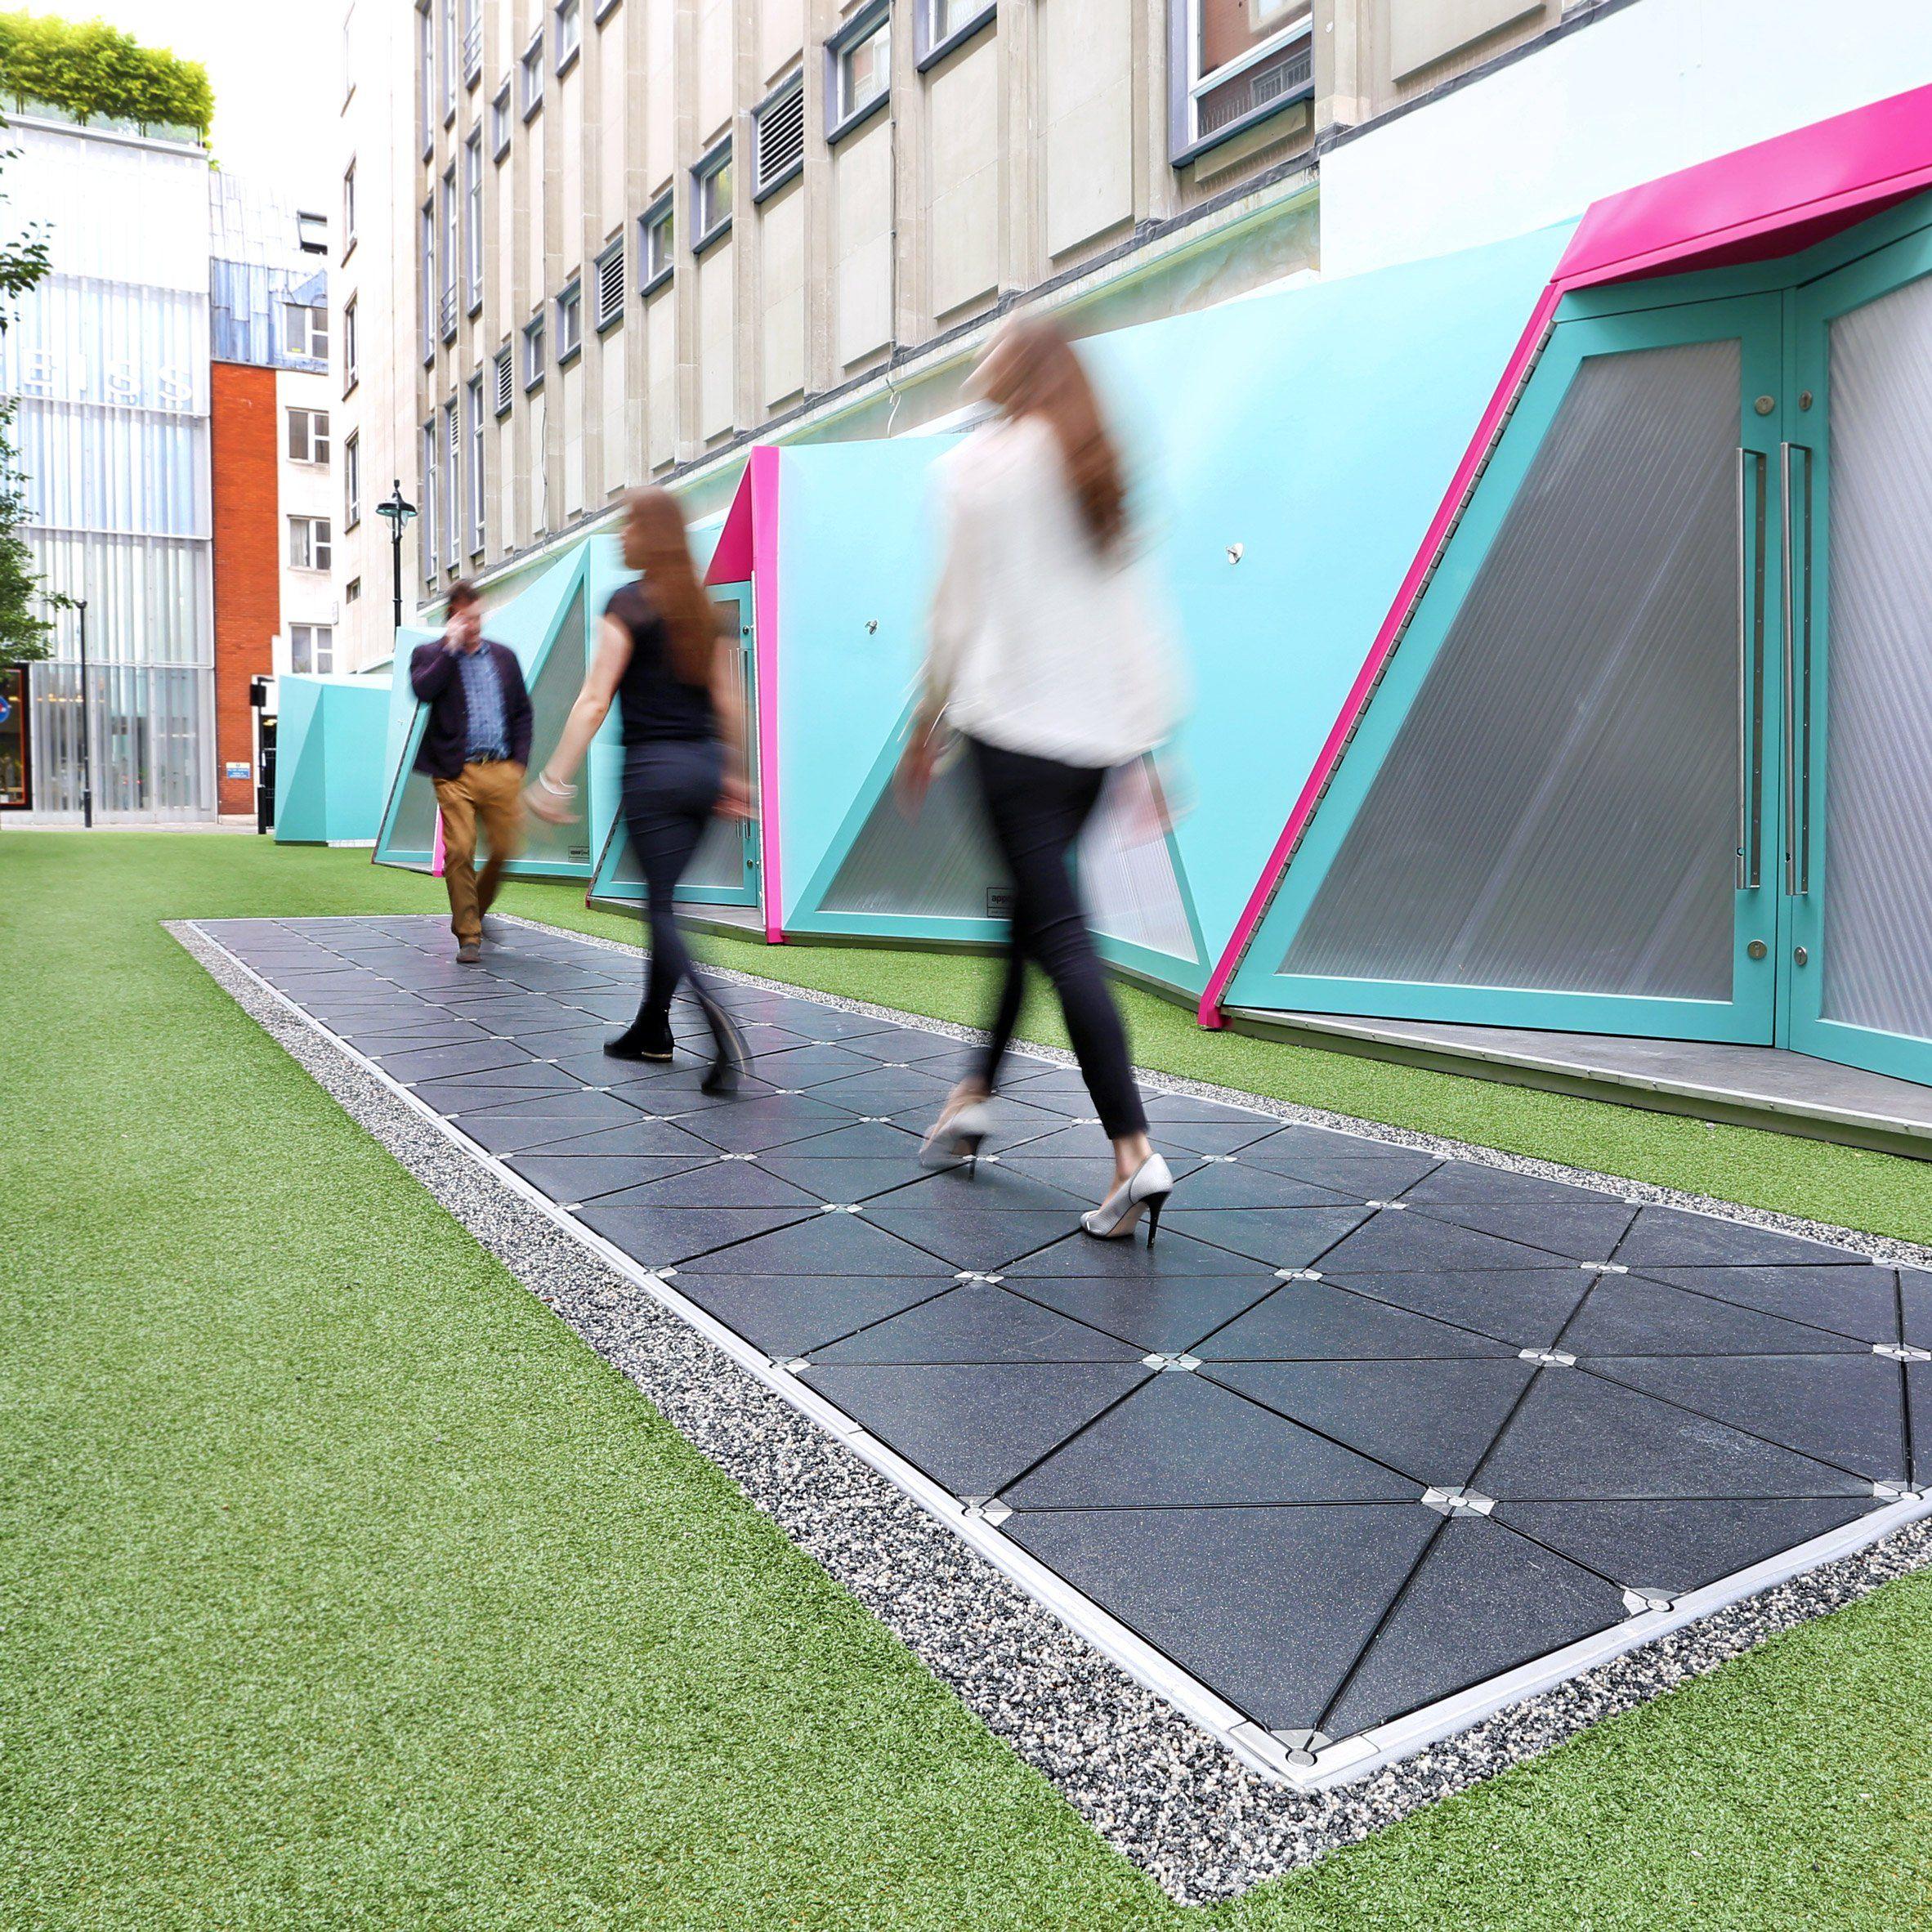 Floor Tiles By Pavegen Harvesting And Storing Kinetic Energy To Turn On Public Lighting Design Dezeen Green Design